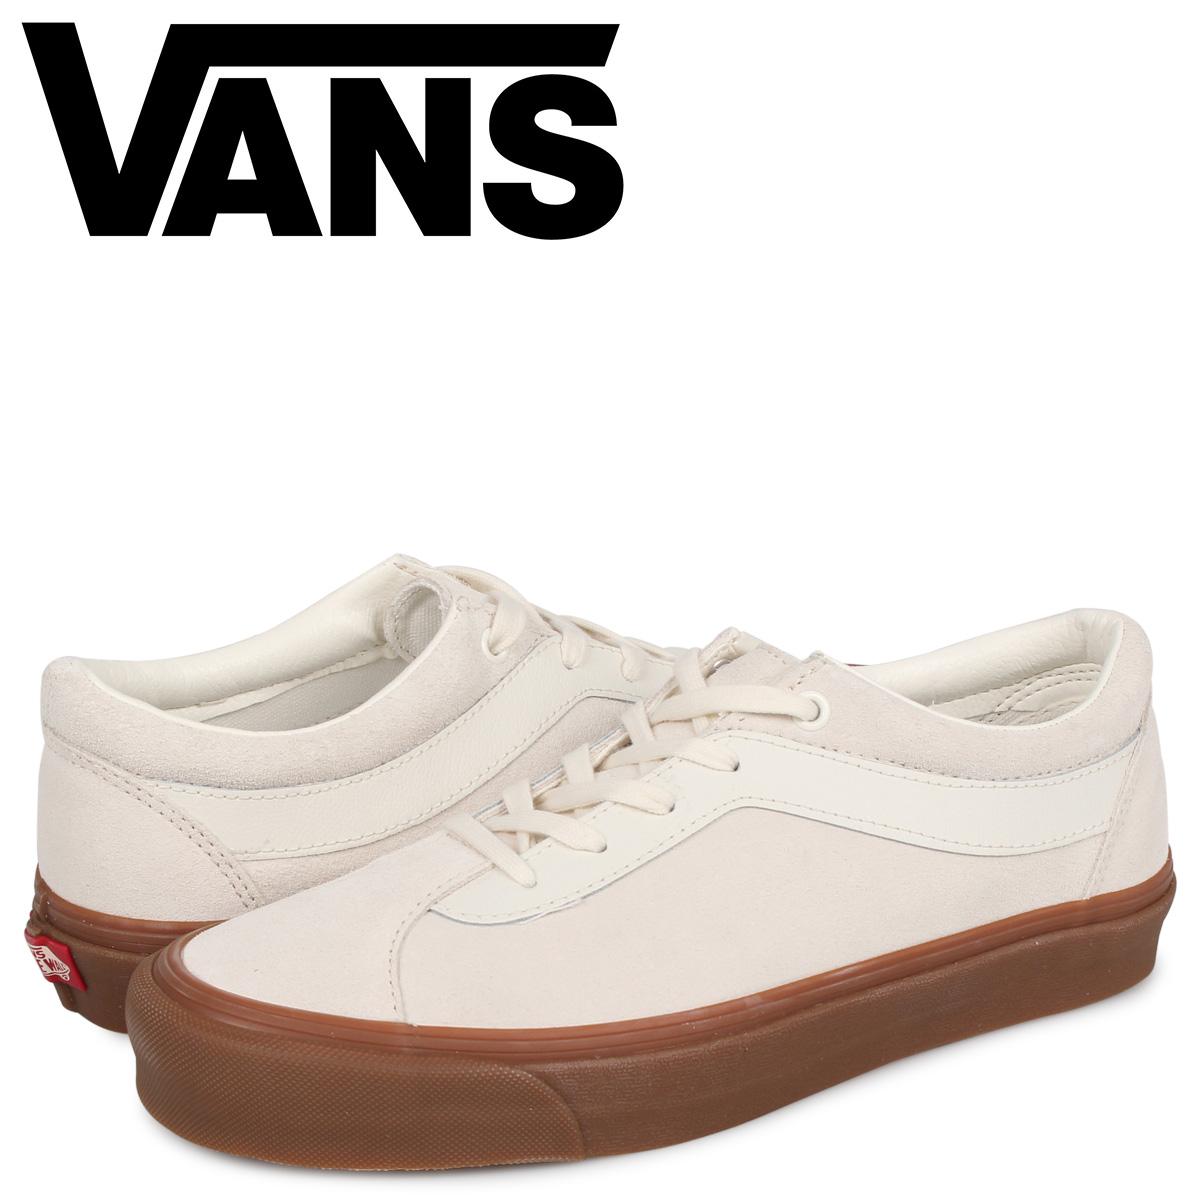 VANS バンズ BOLD NI スニーカー メンズ ヴァンズ ボールド ホワイト 白 VN0A3WLPT95